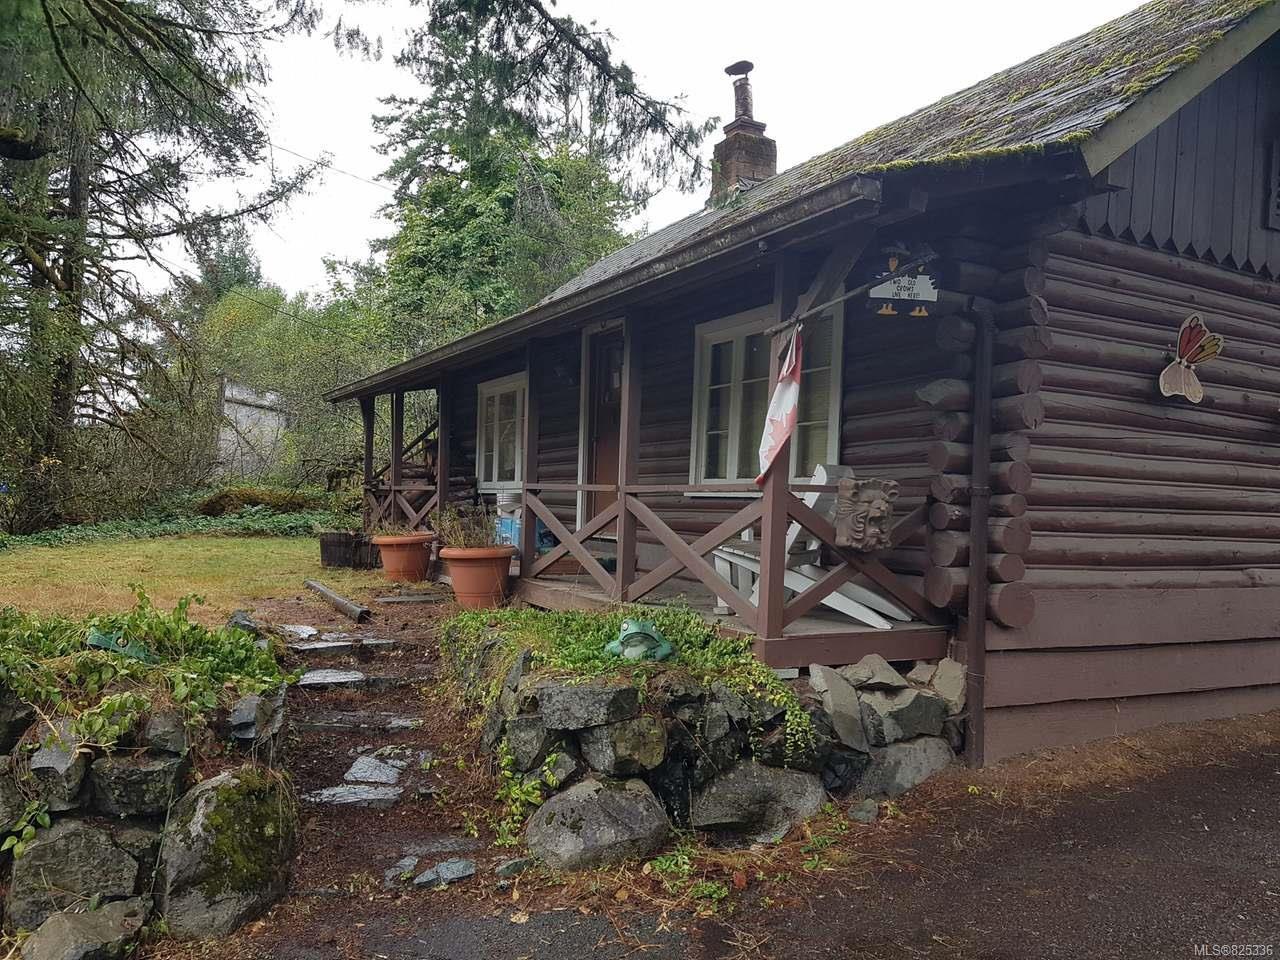 Main Photo: 8051 Pacific Rim Hwy in PORT ALBERNI: PA Sproat Lake House for sale (Port Alberni)  : MLS®# 825336